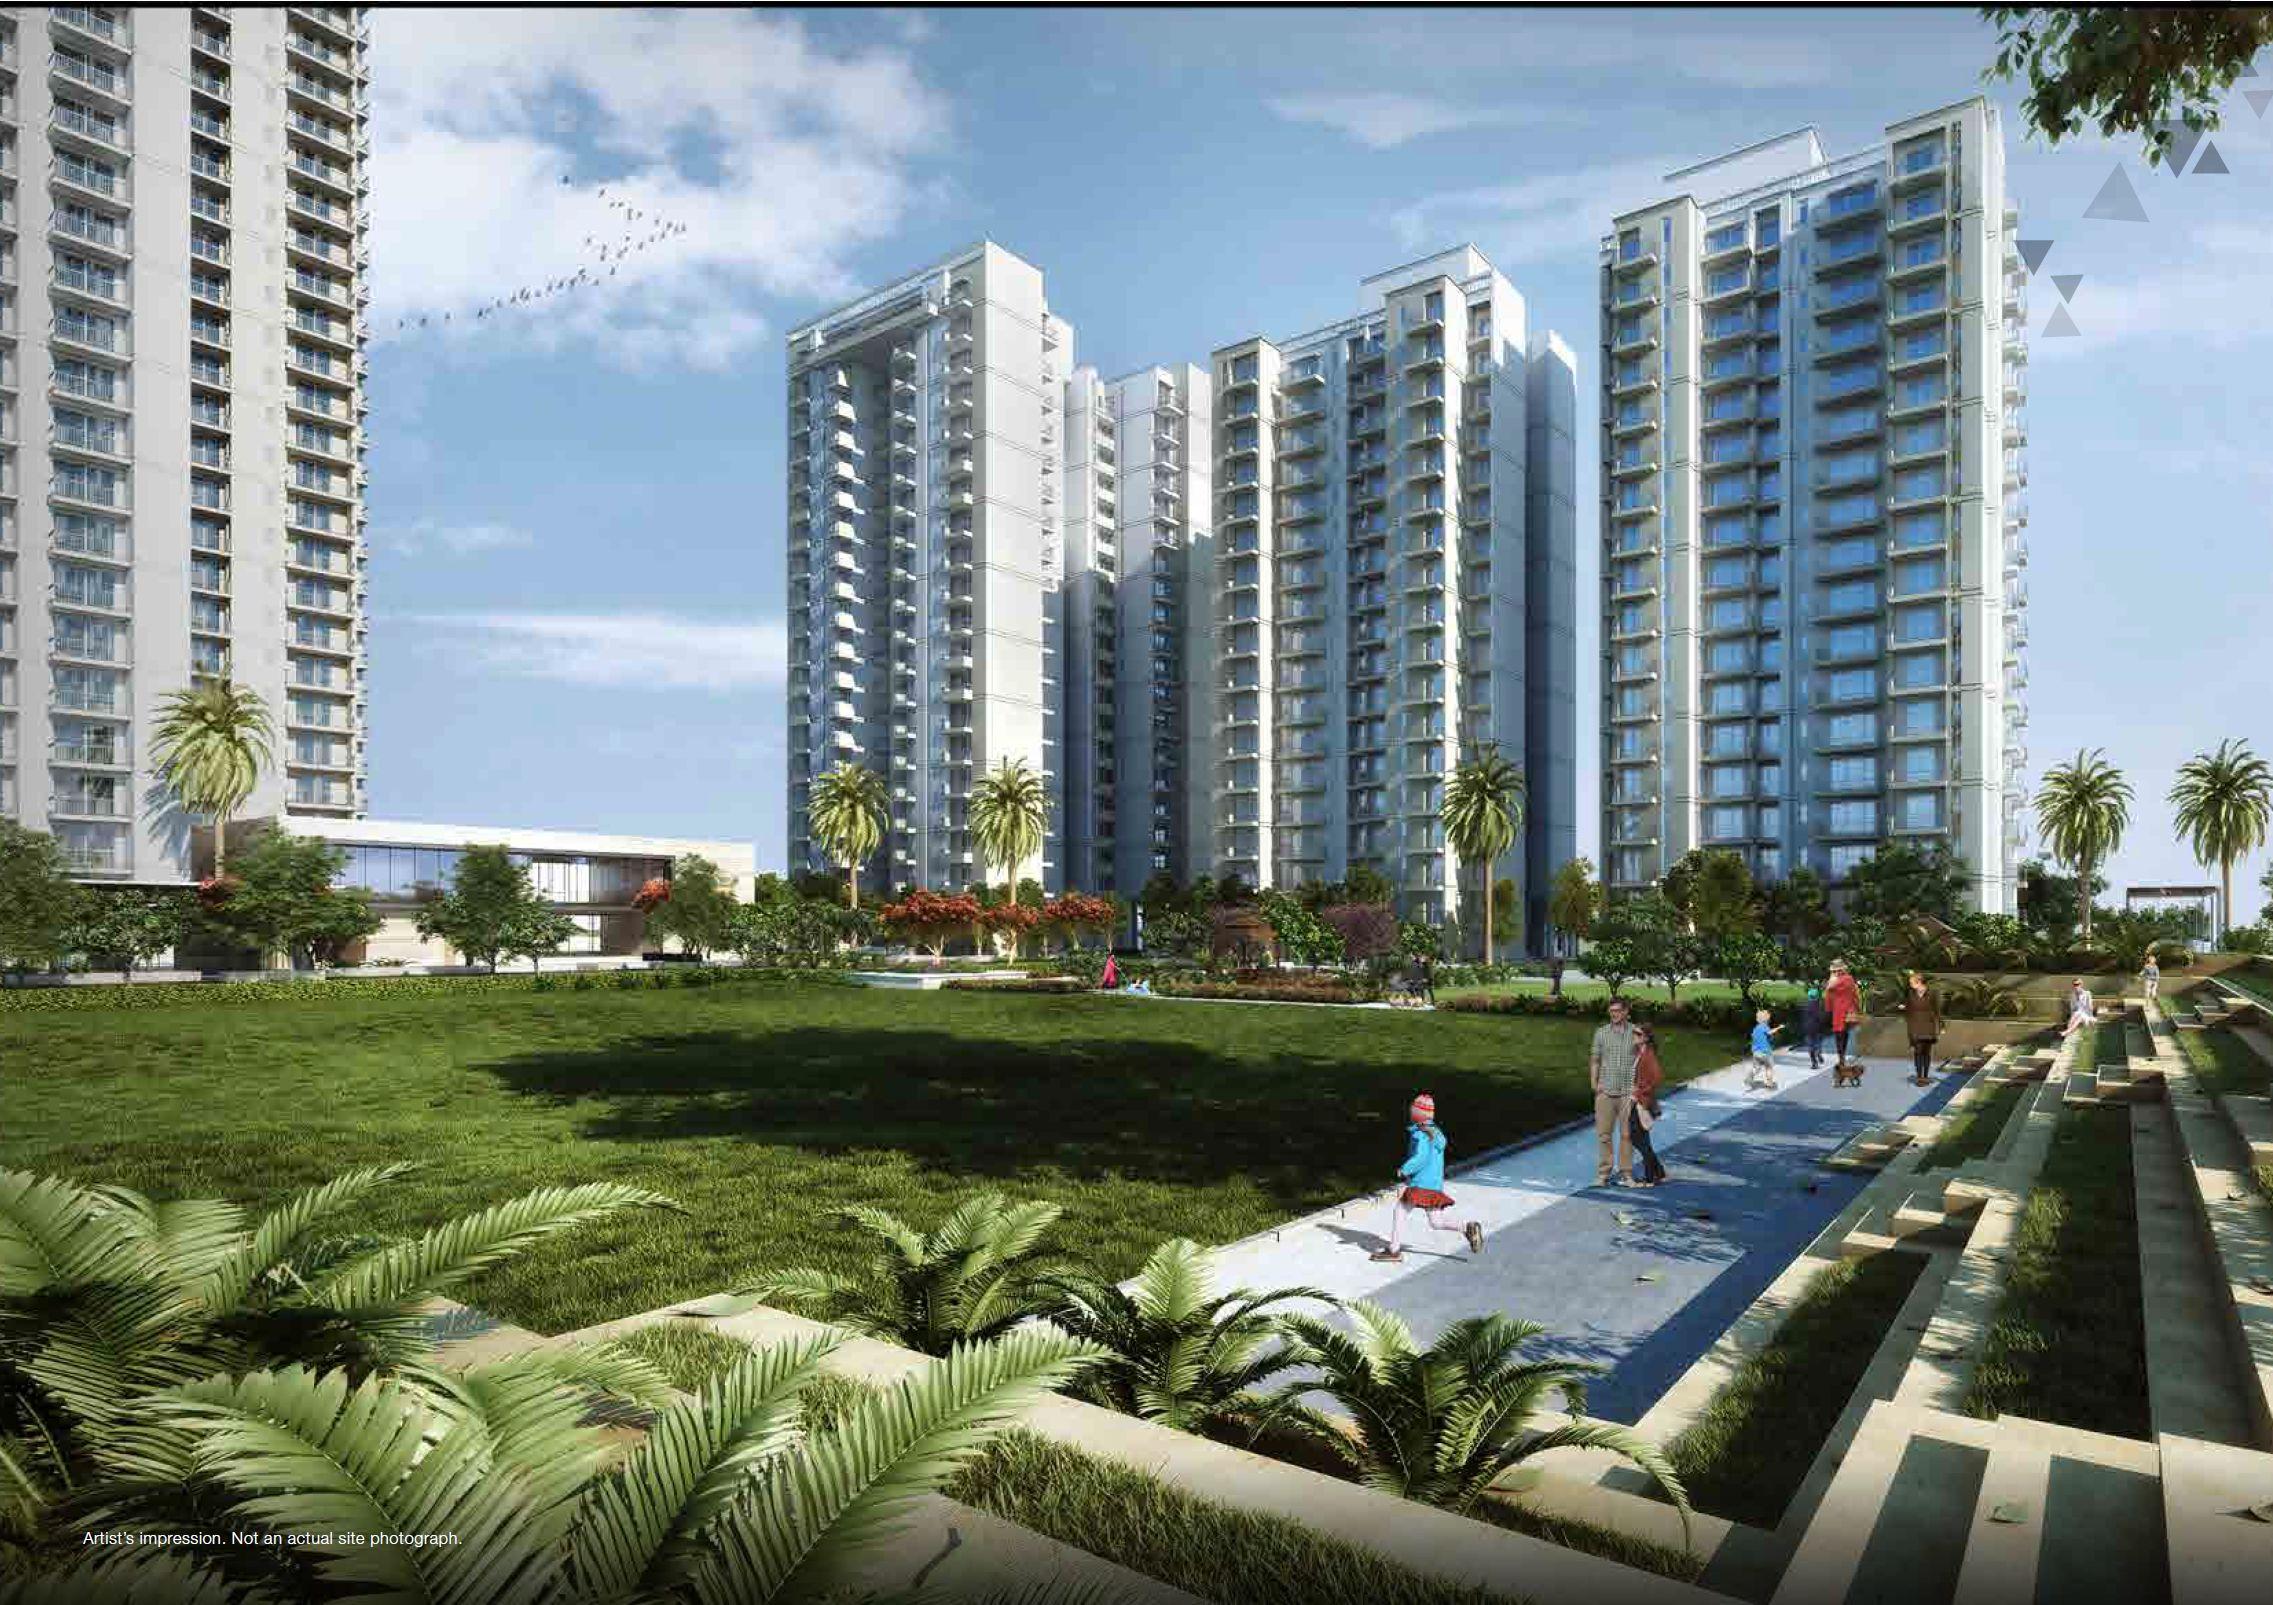 Godrej Nurture, Noida - Residential Apartments for sale